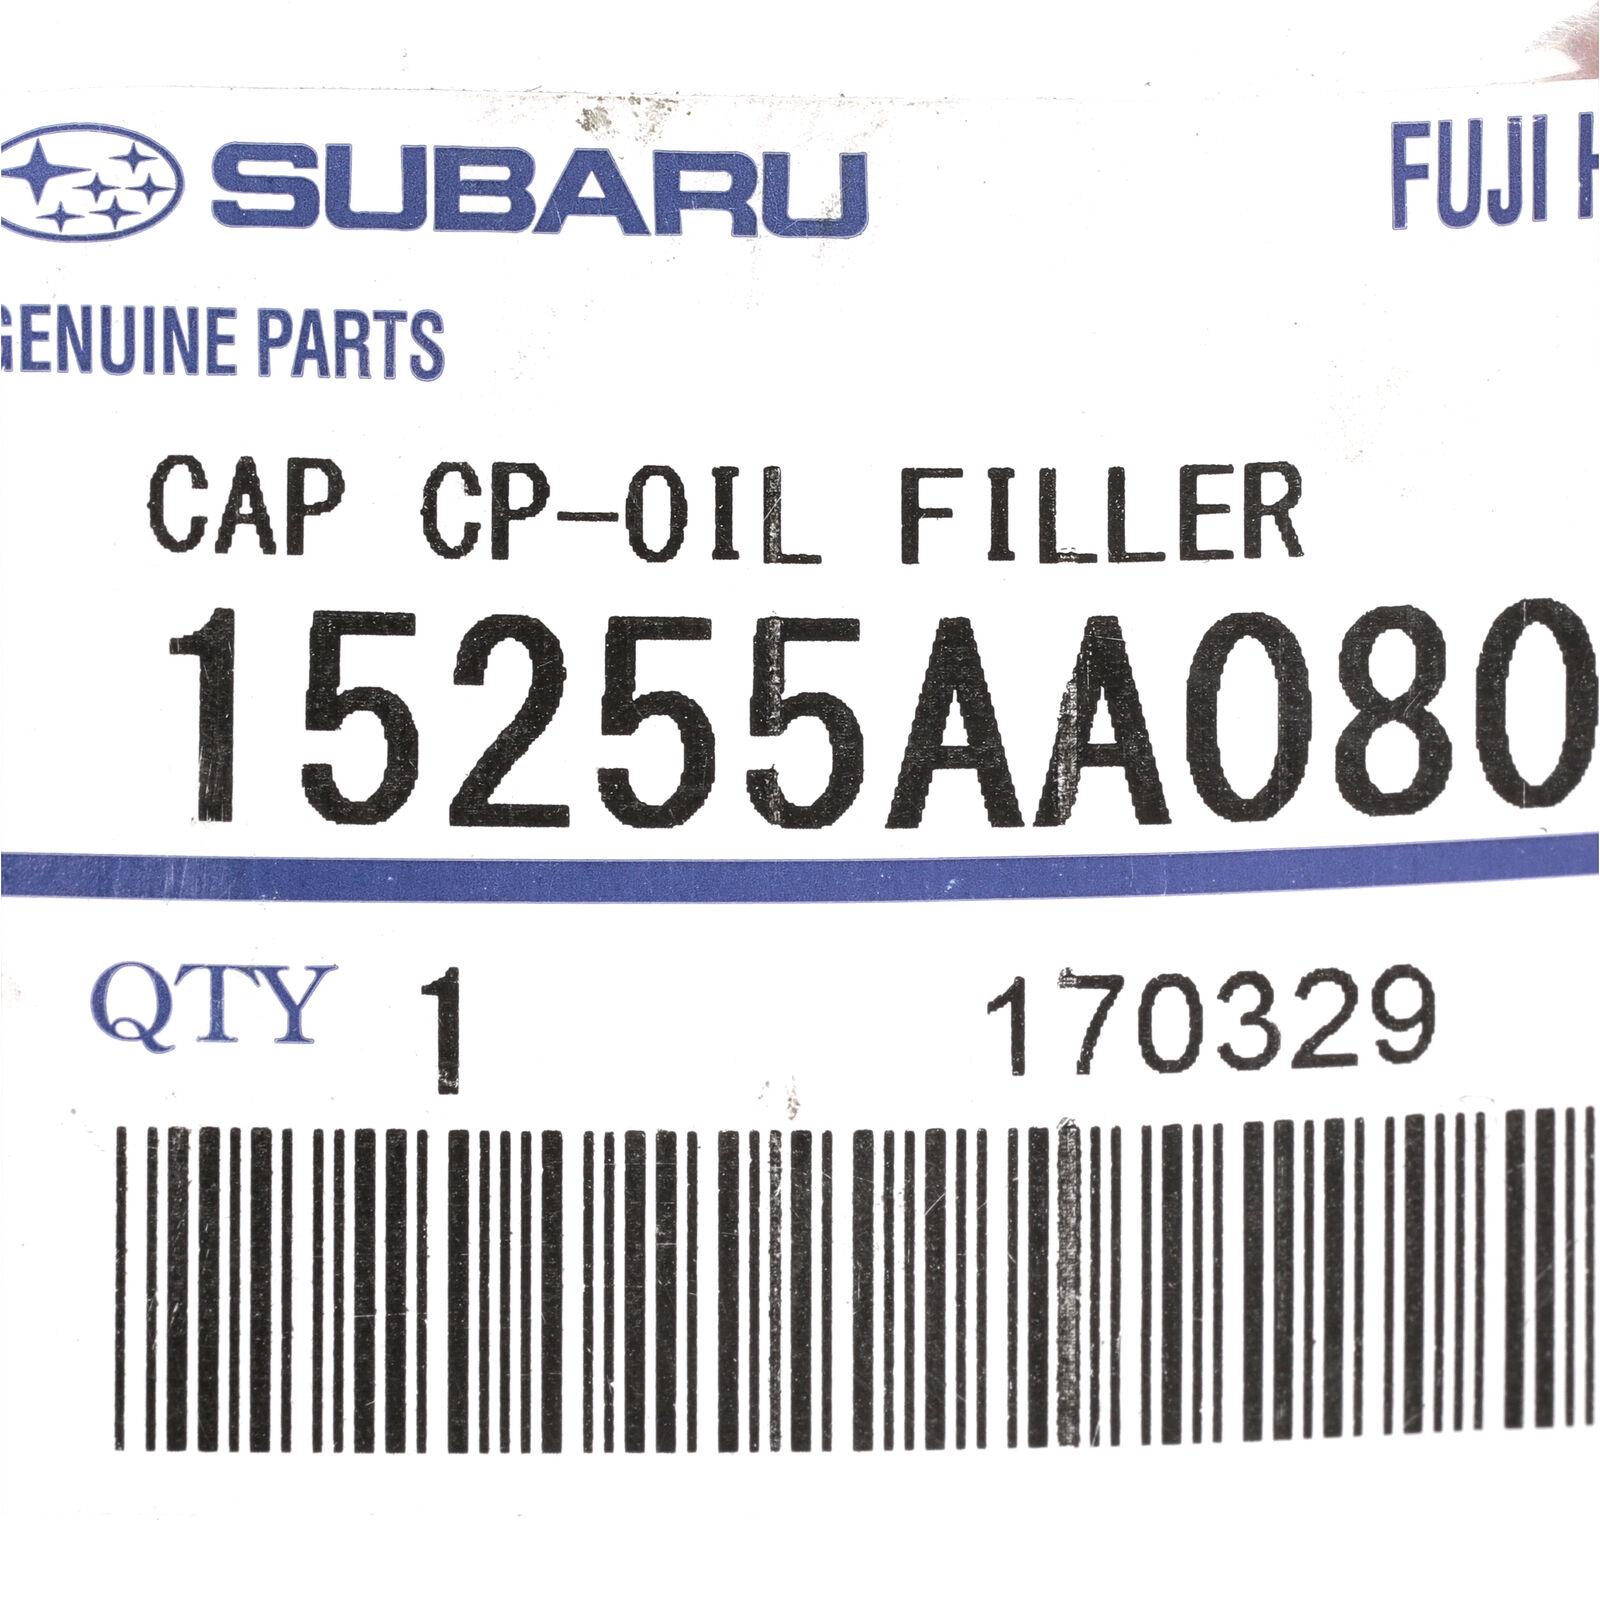 87-02 Subaru Oil Filler Cap Forester Impreza Legacy Outback OEM